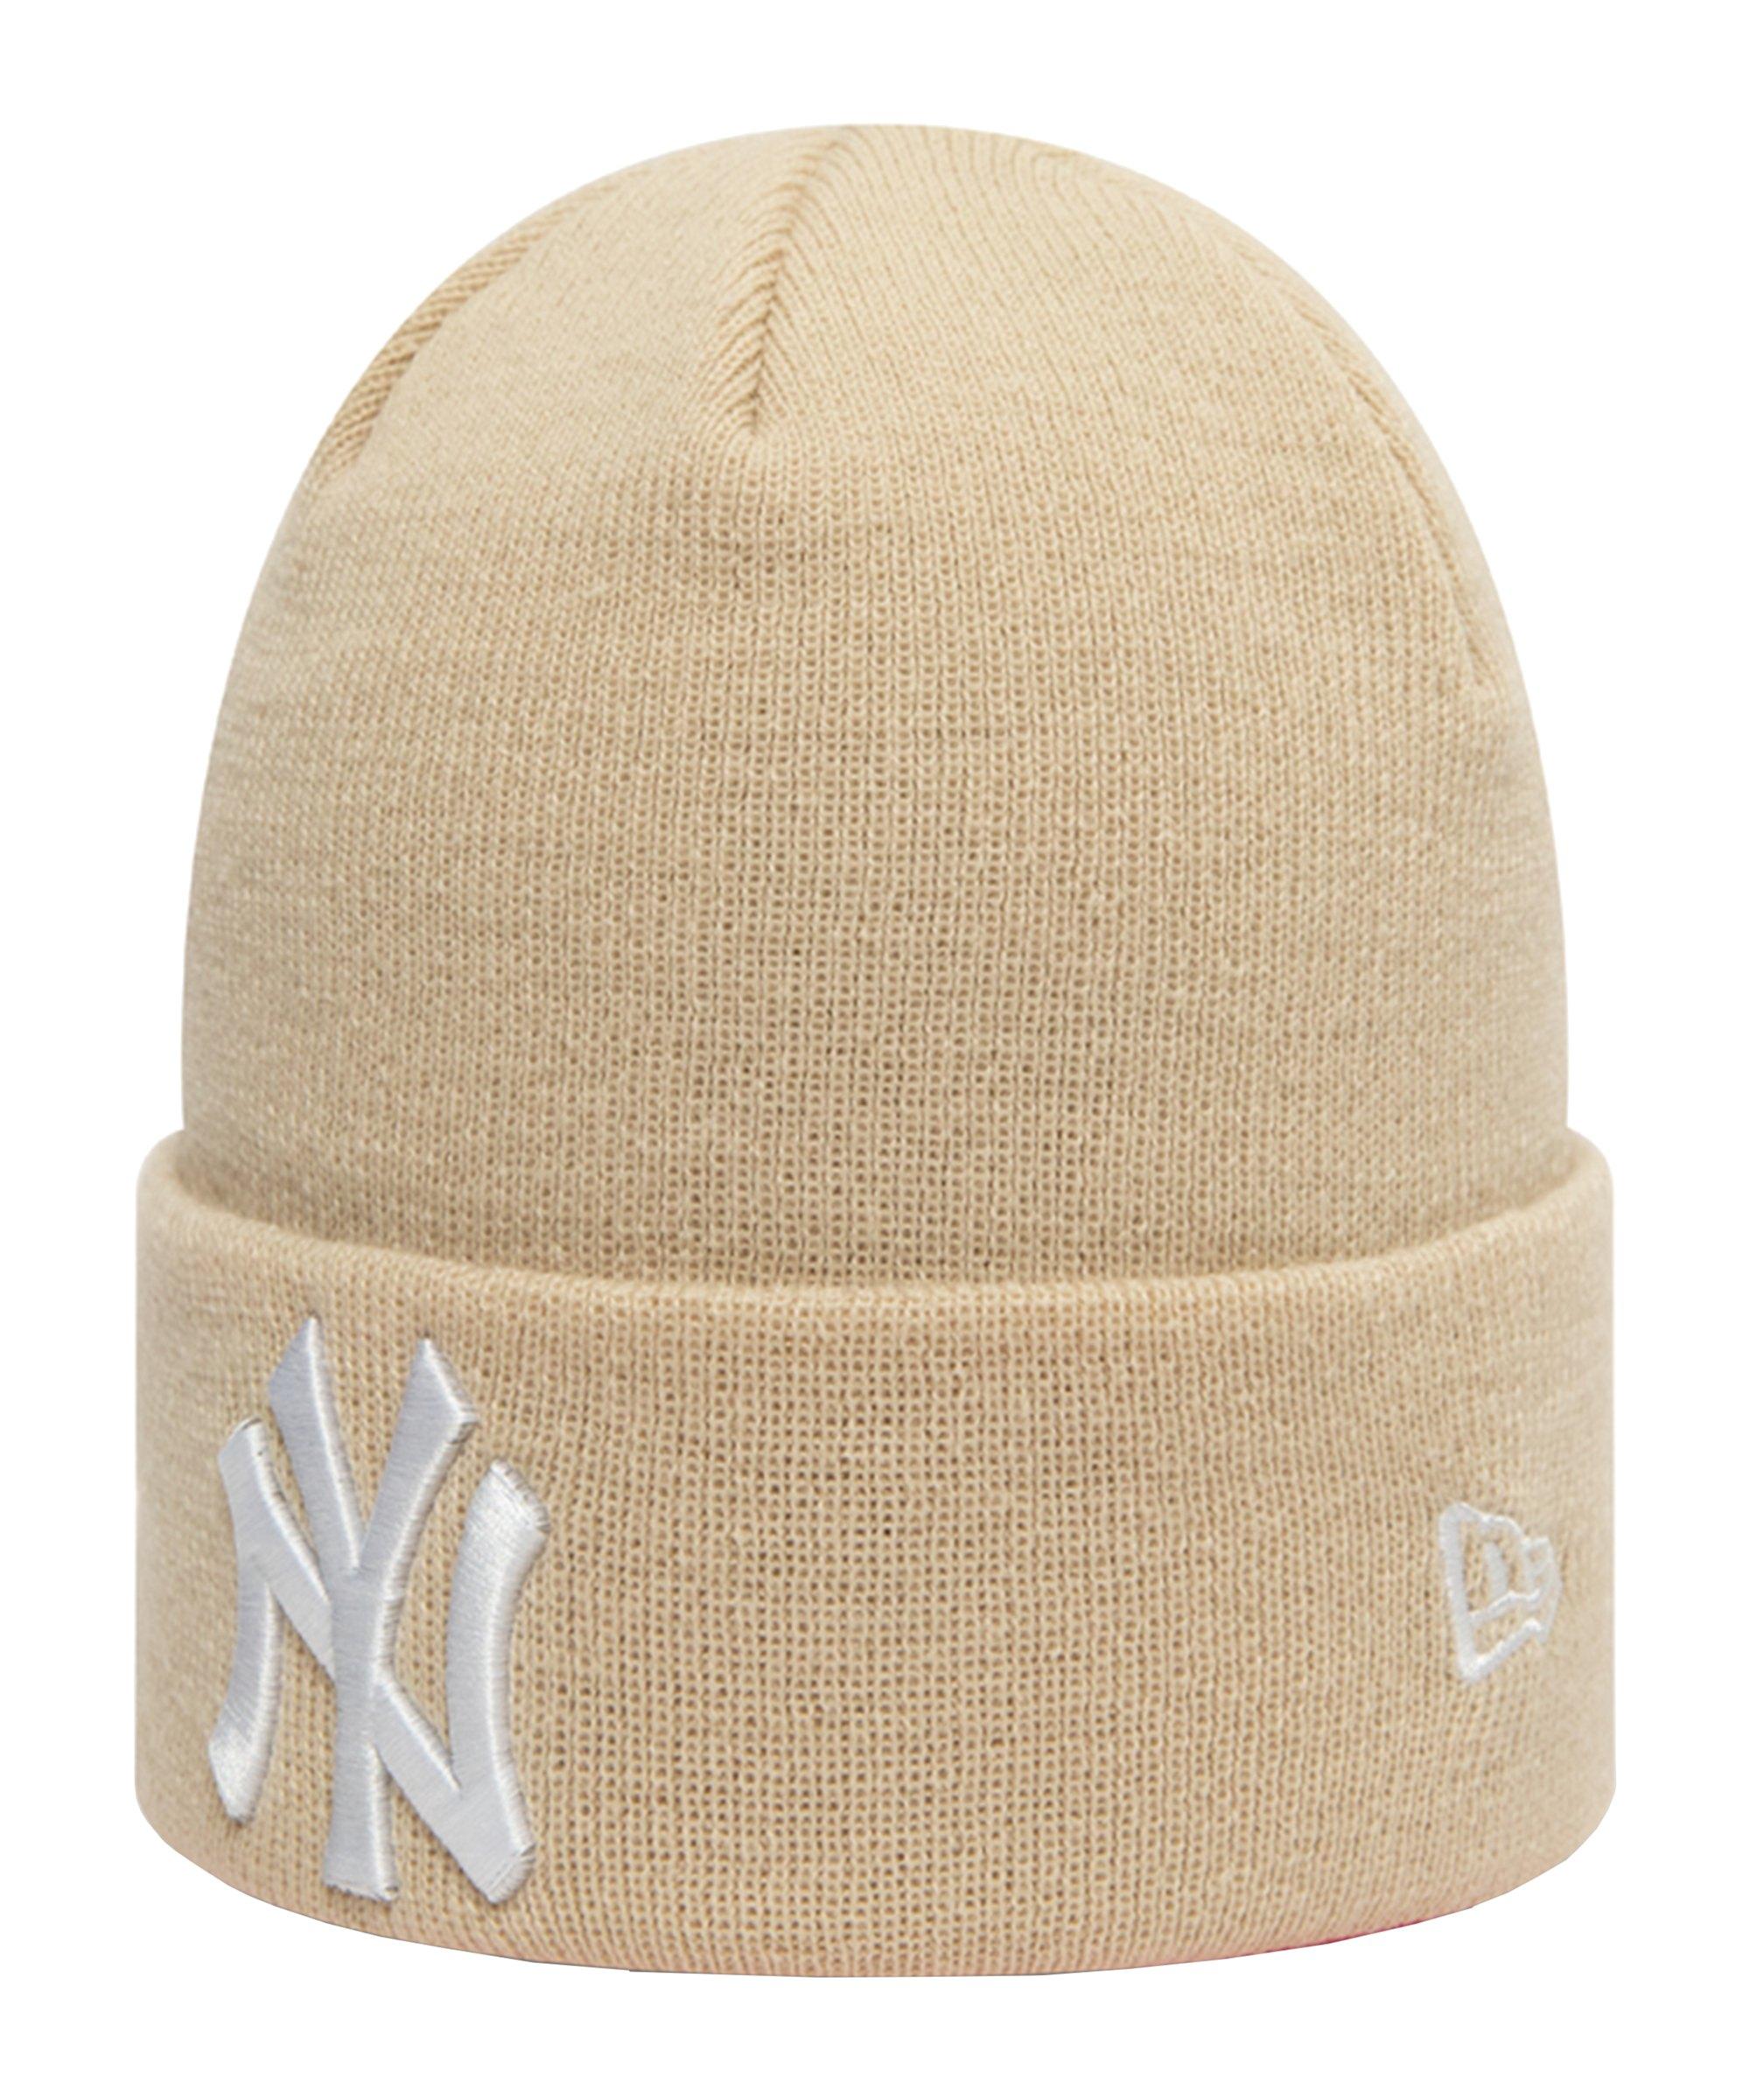 New Era NY Yankees Essential Cuff Mütze FSTN - beige